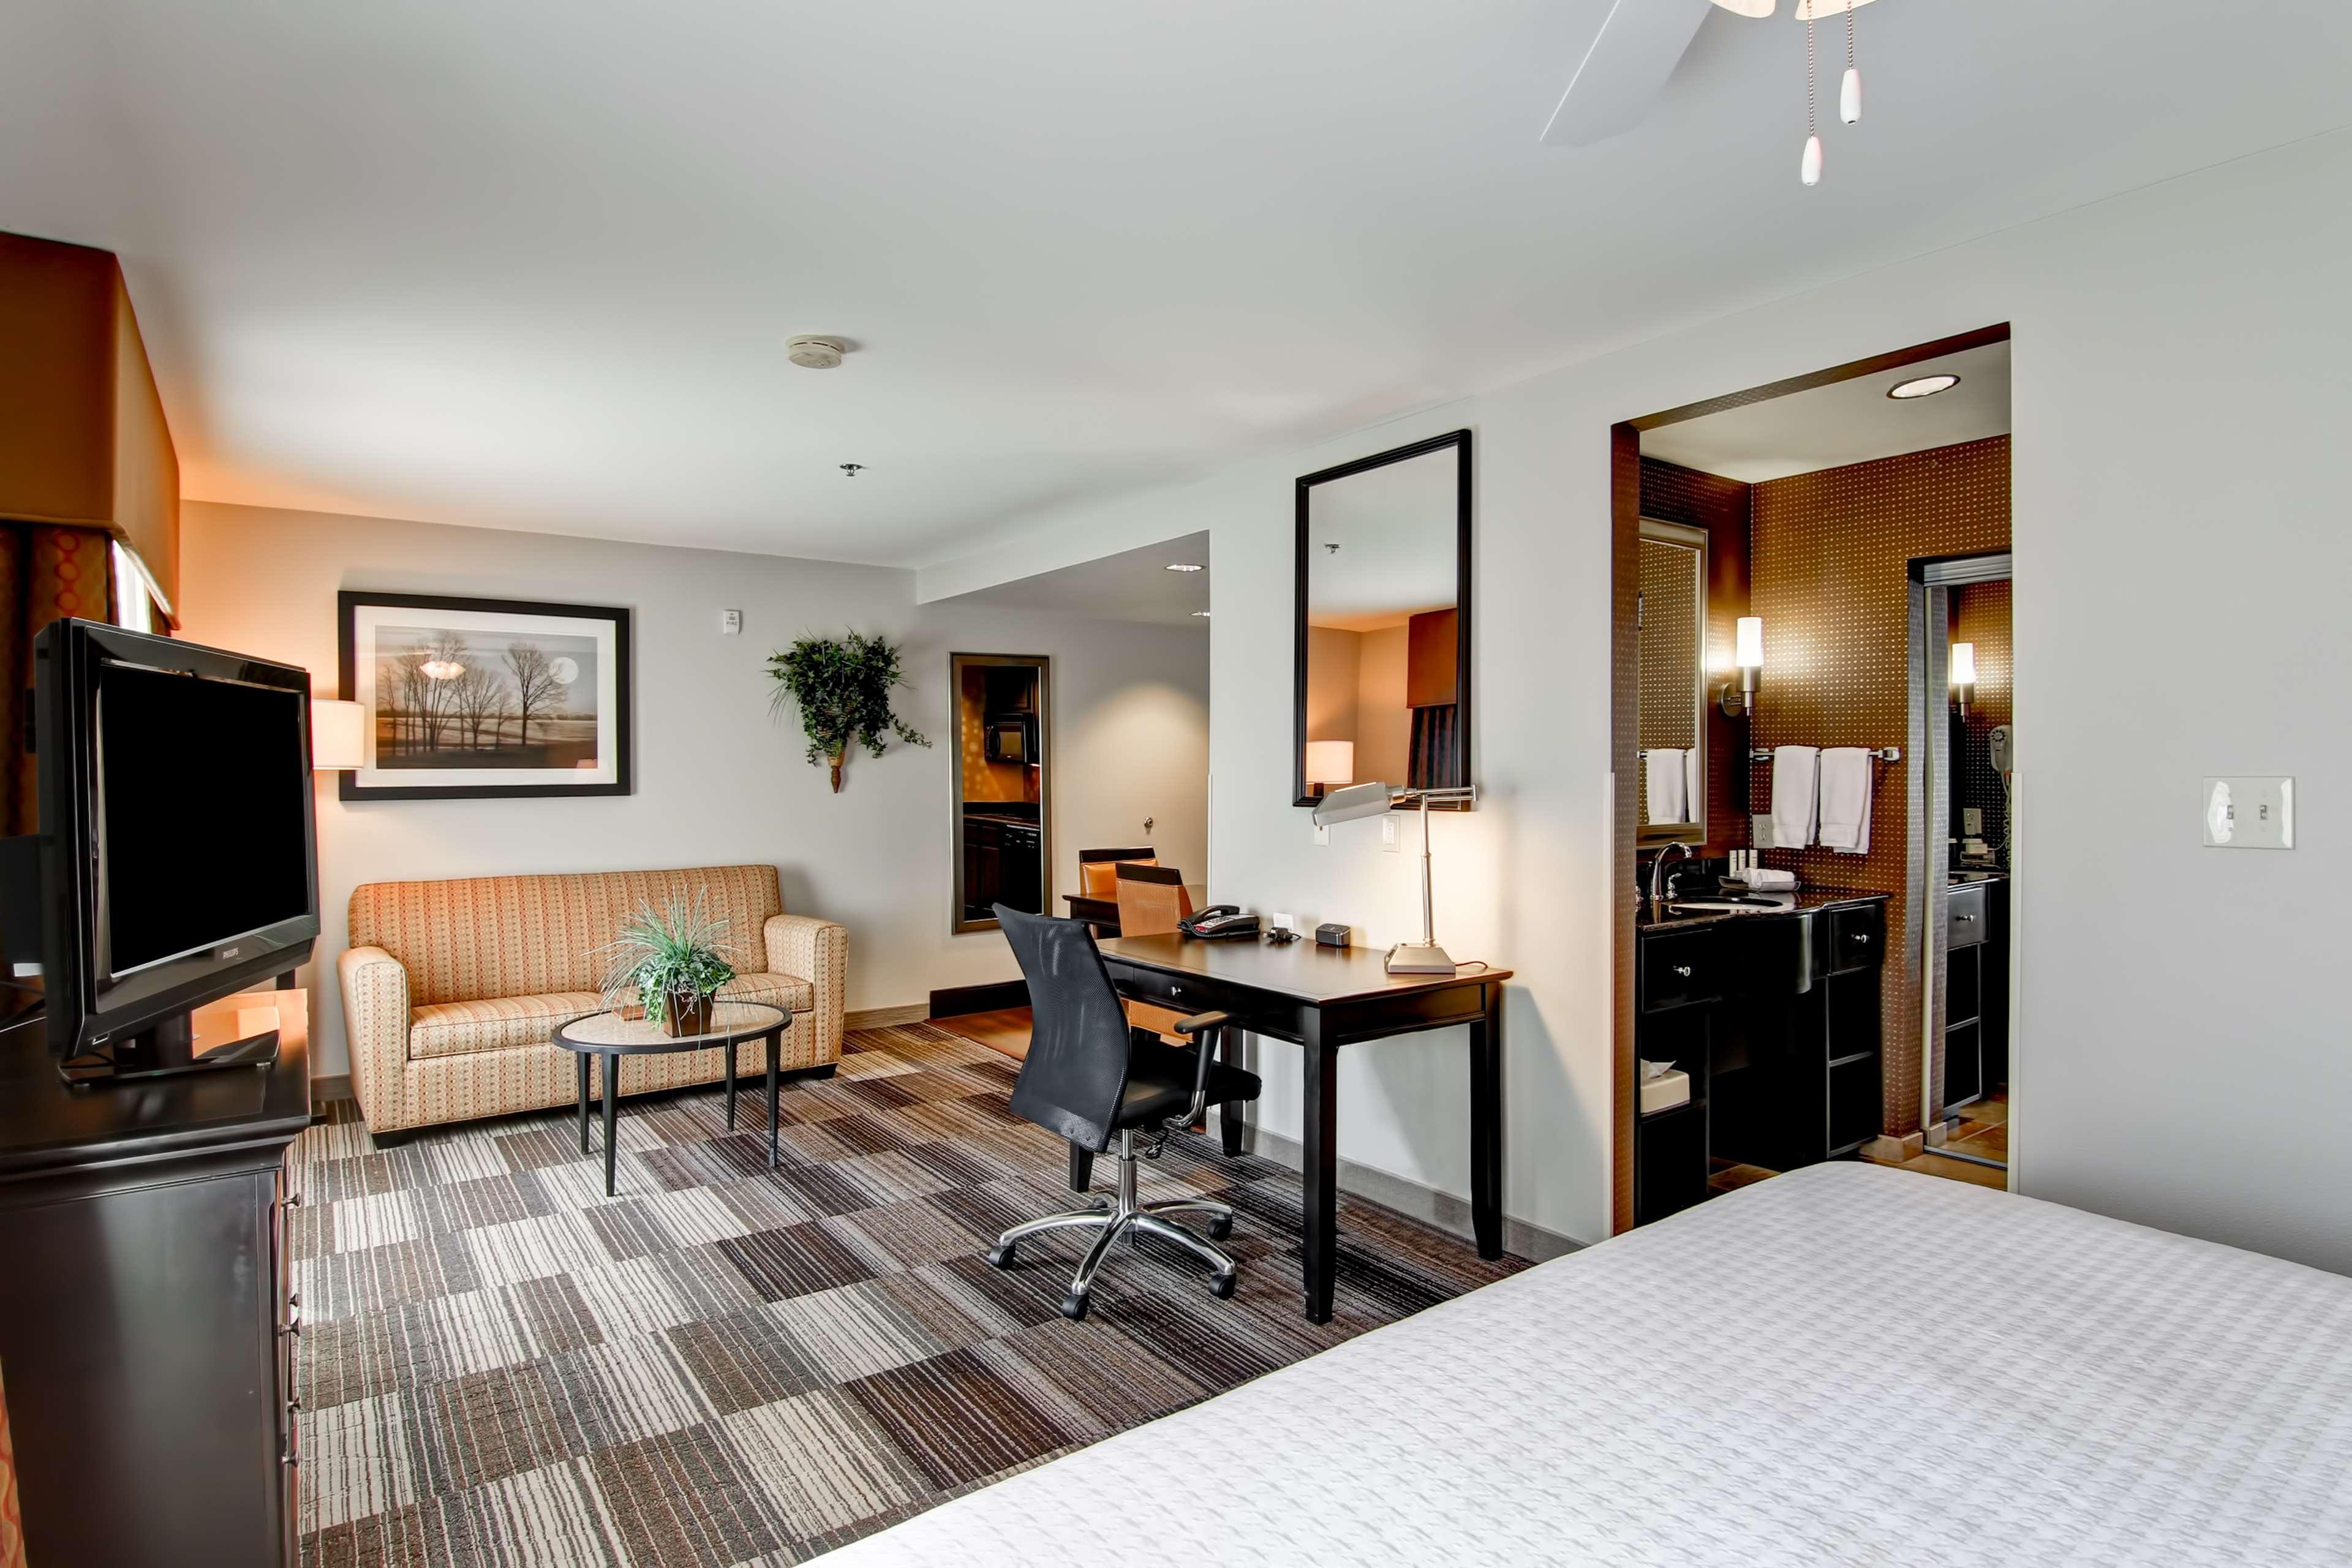 Homewood Suites by Hilton Cincinnati Airport South-Florence image 31